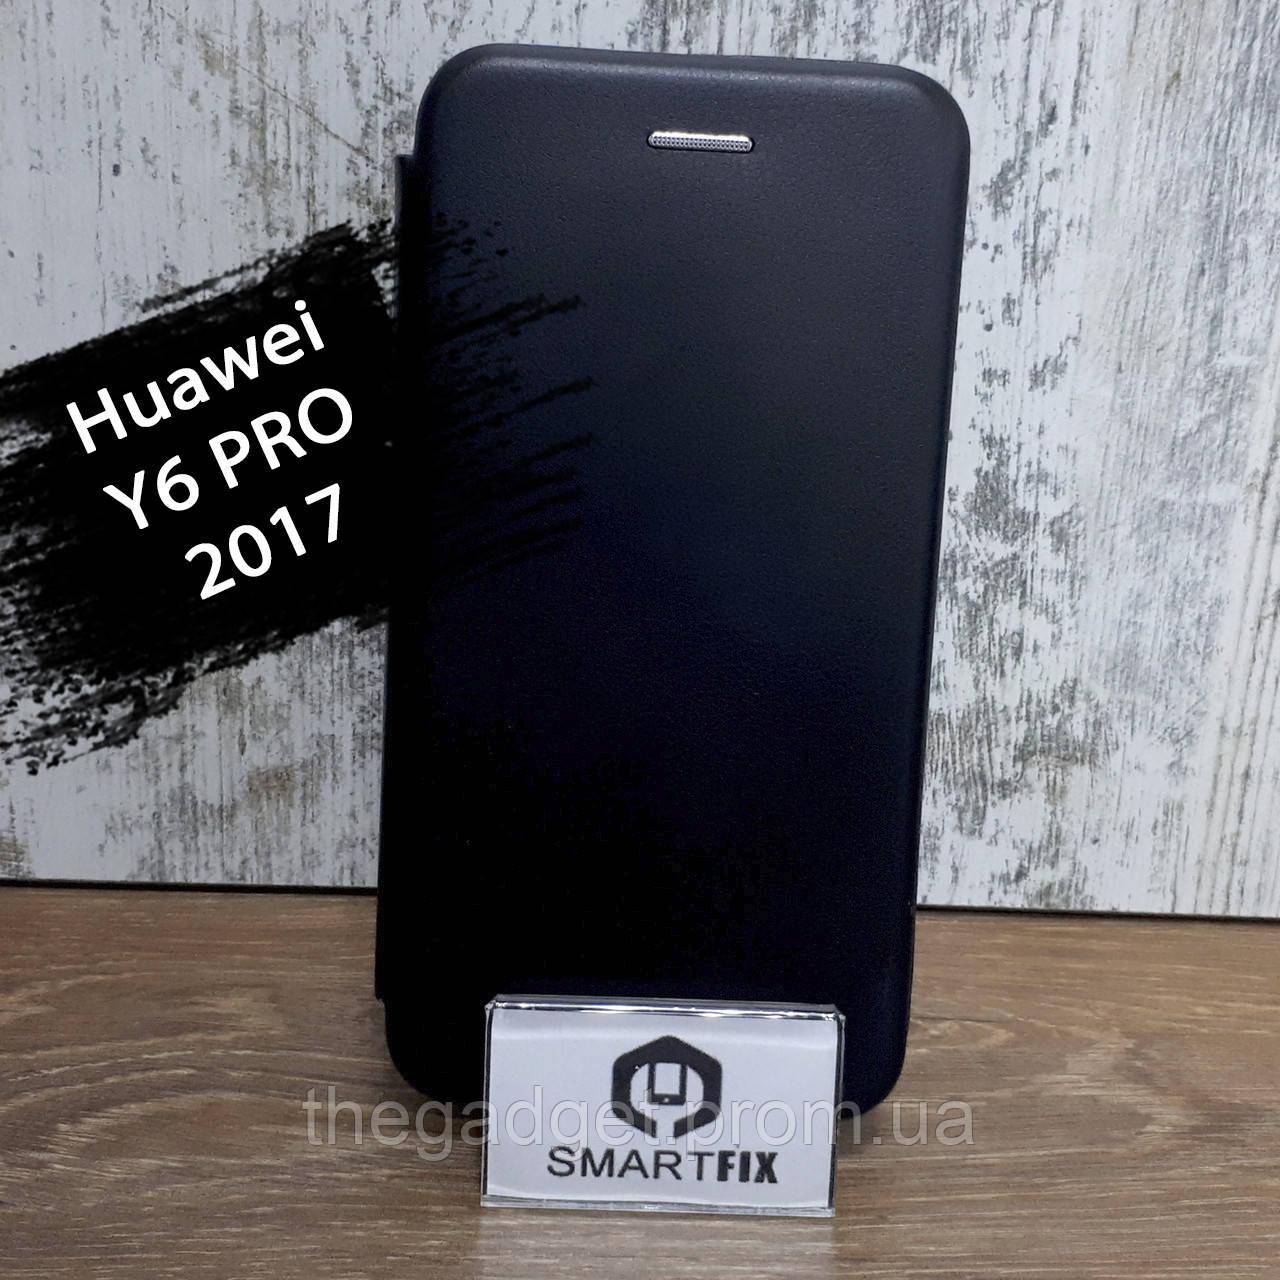 Чехол книжка для Huawei Y6 PRO (2017) / Nova Lite 2017 / P9 Mini (SLA-L02) G-Case Черный